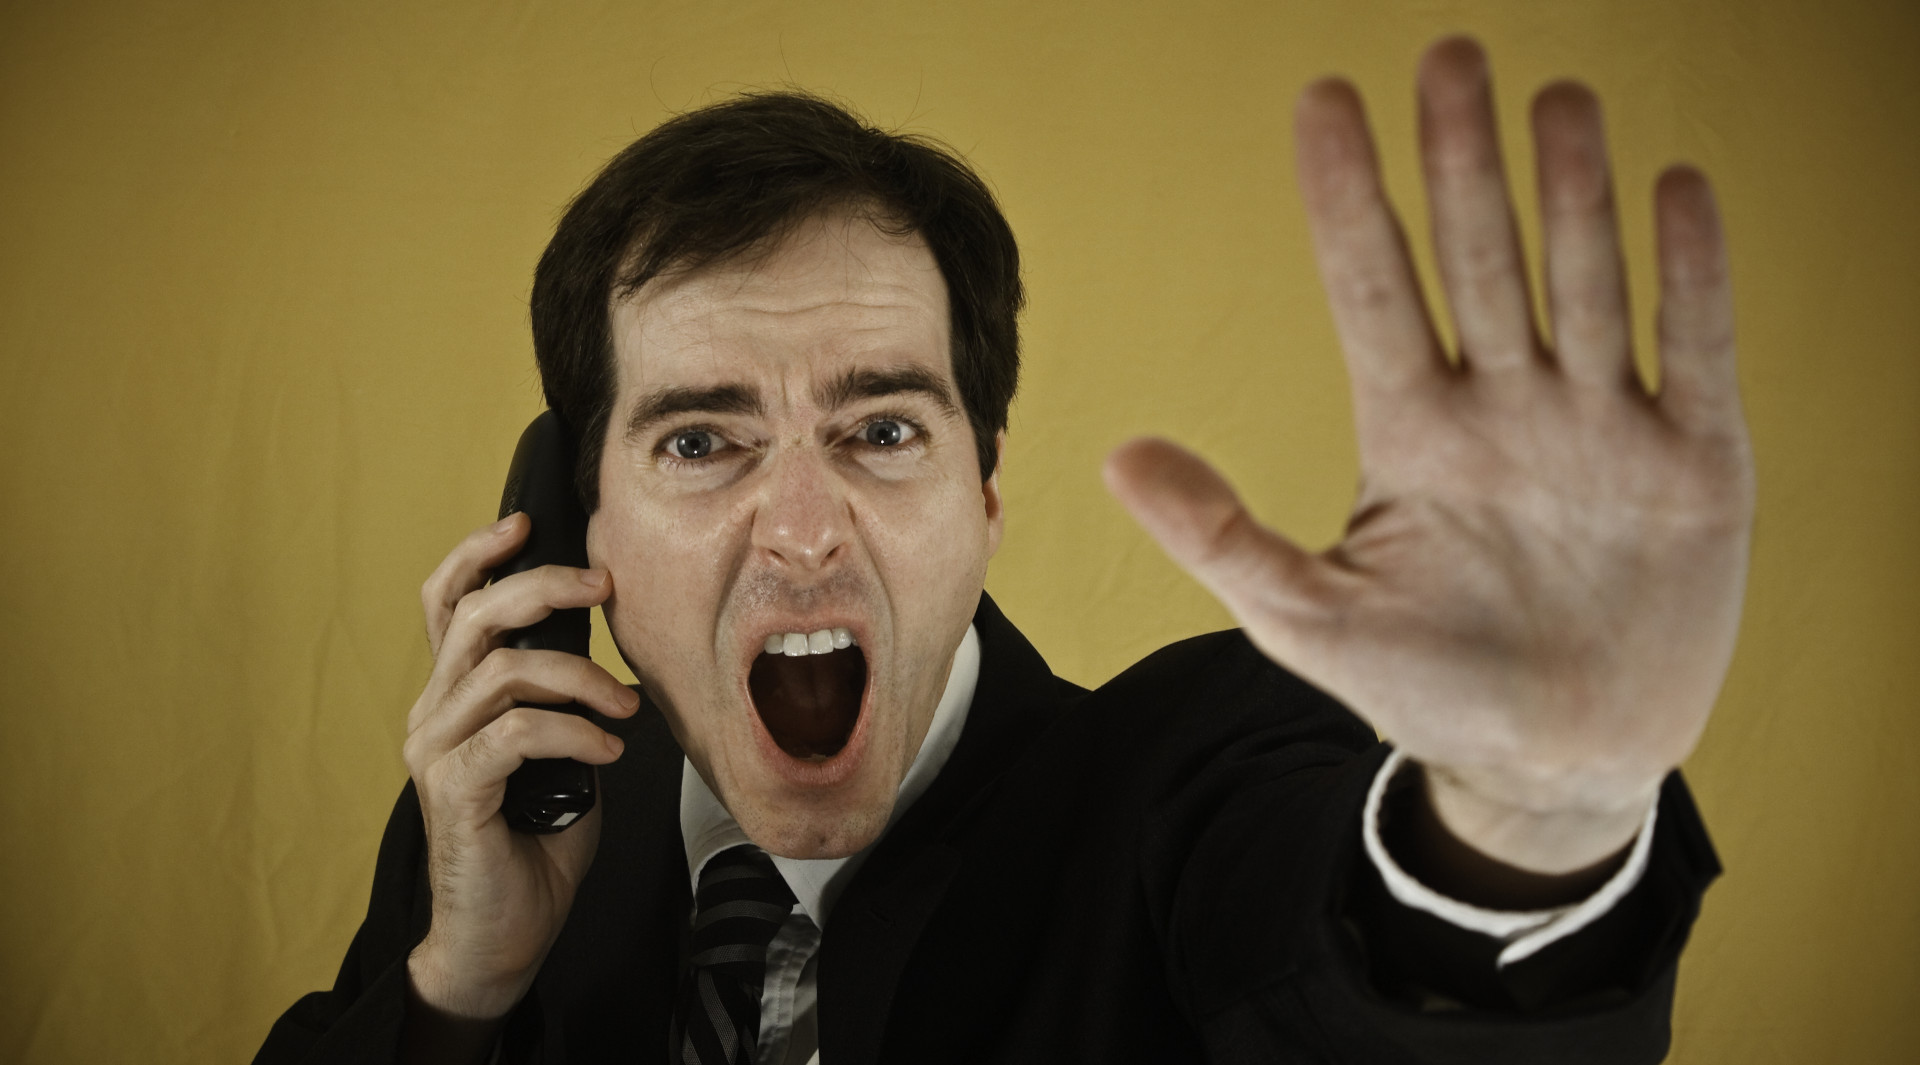 stop-robocalls-blog-man-phone-hand